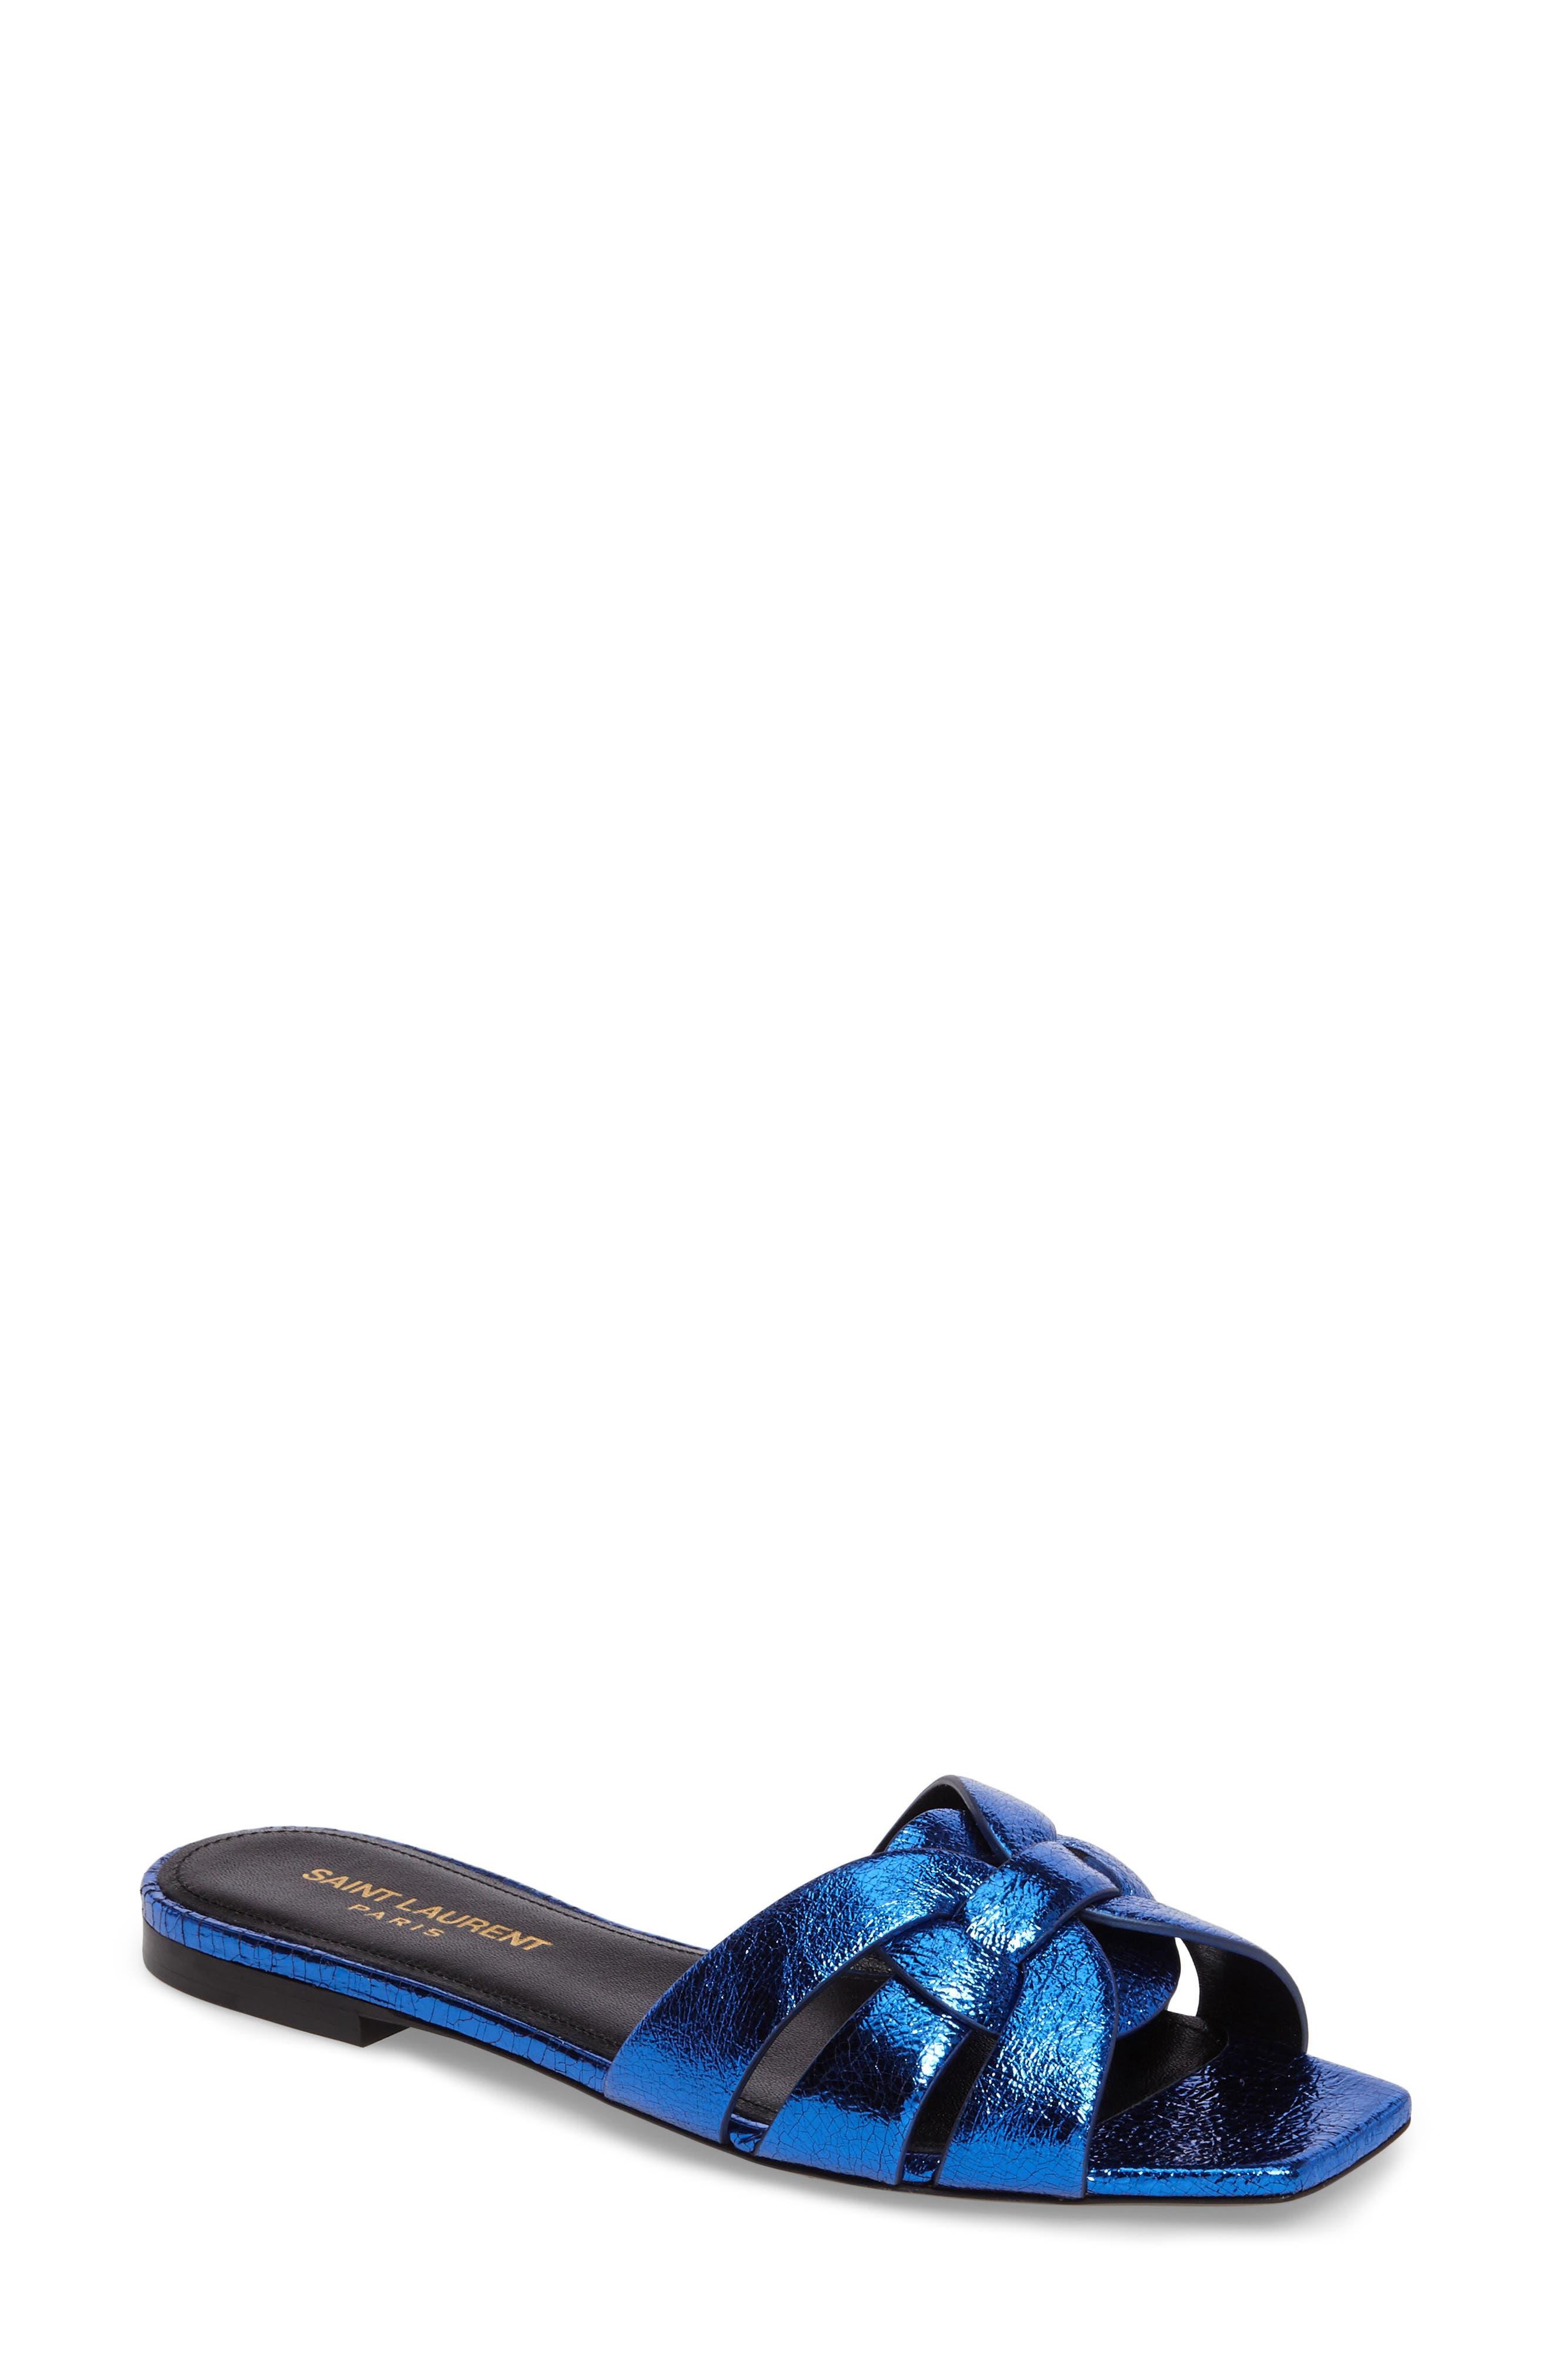 Pieds Metallic Slide Sandal,                         Main,                         color, Blue Metal